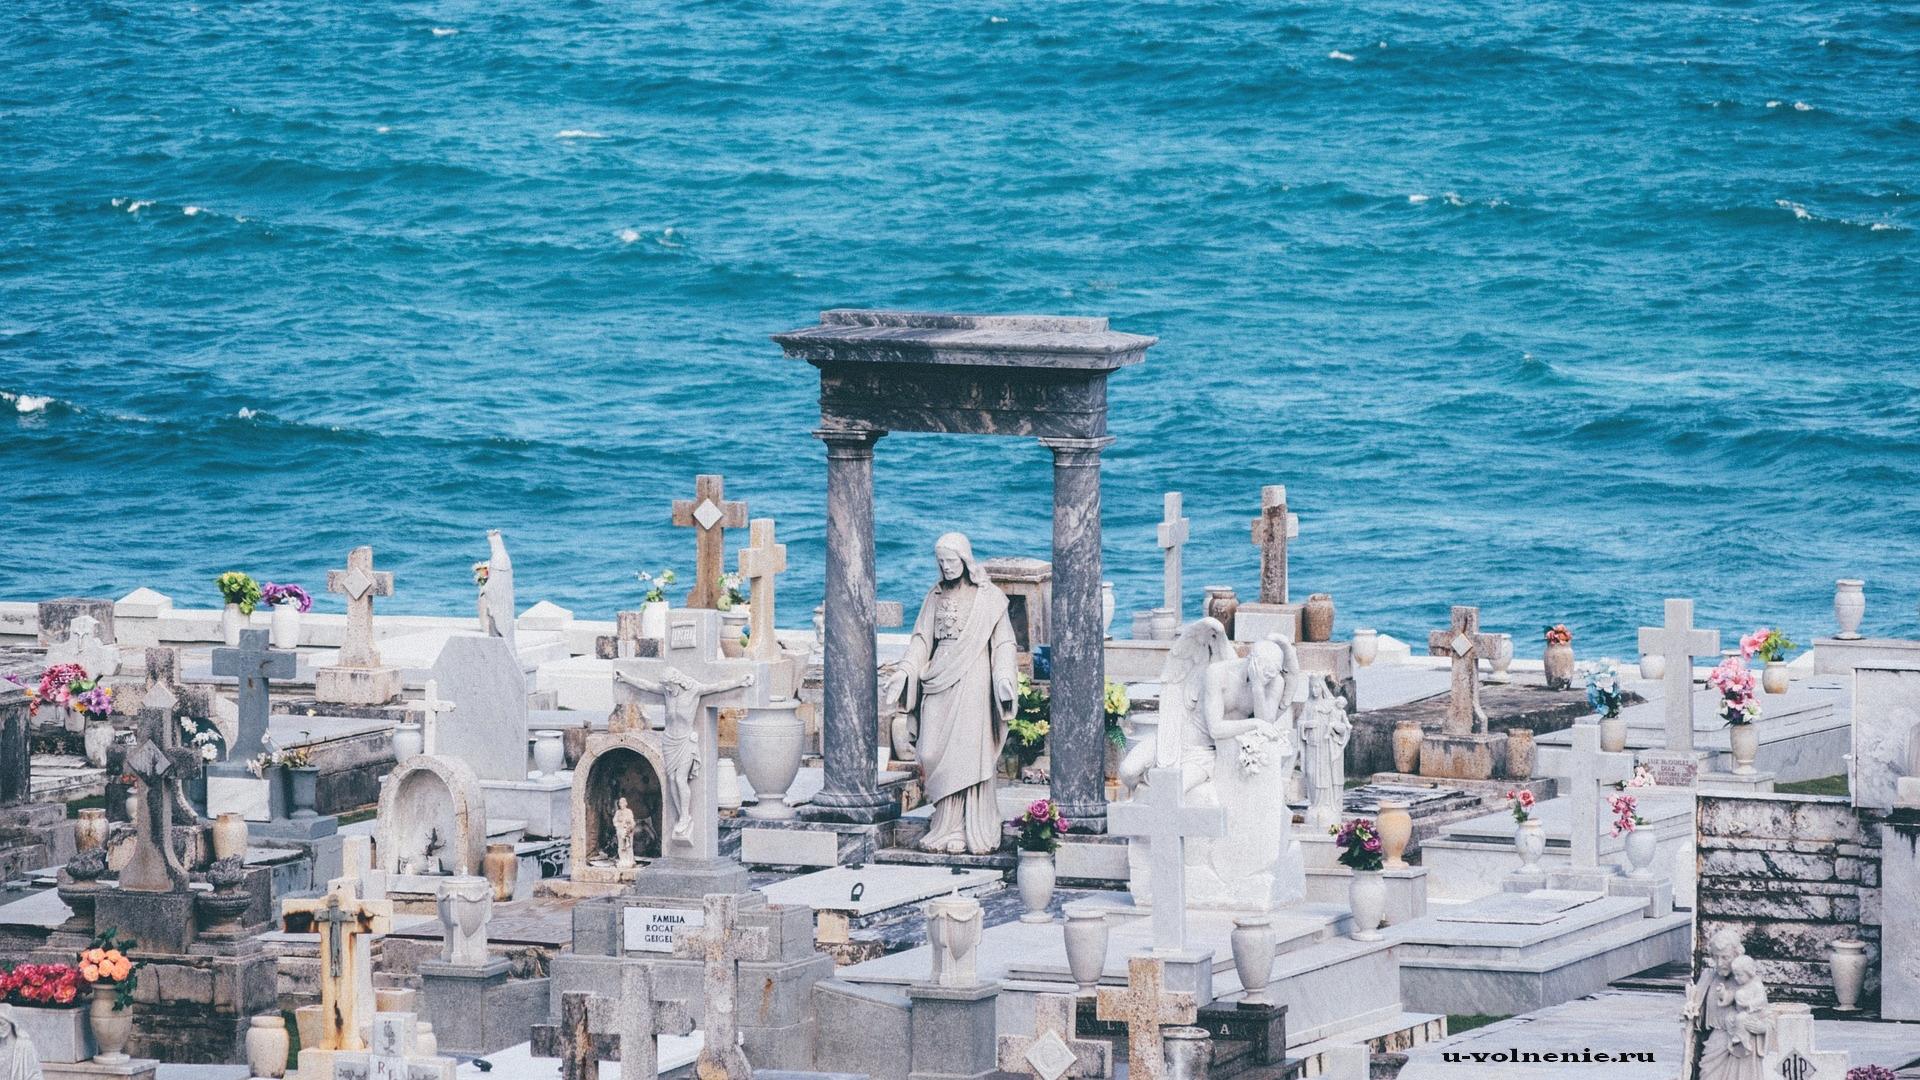 кладбище на море